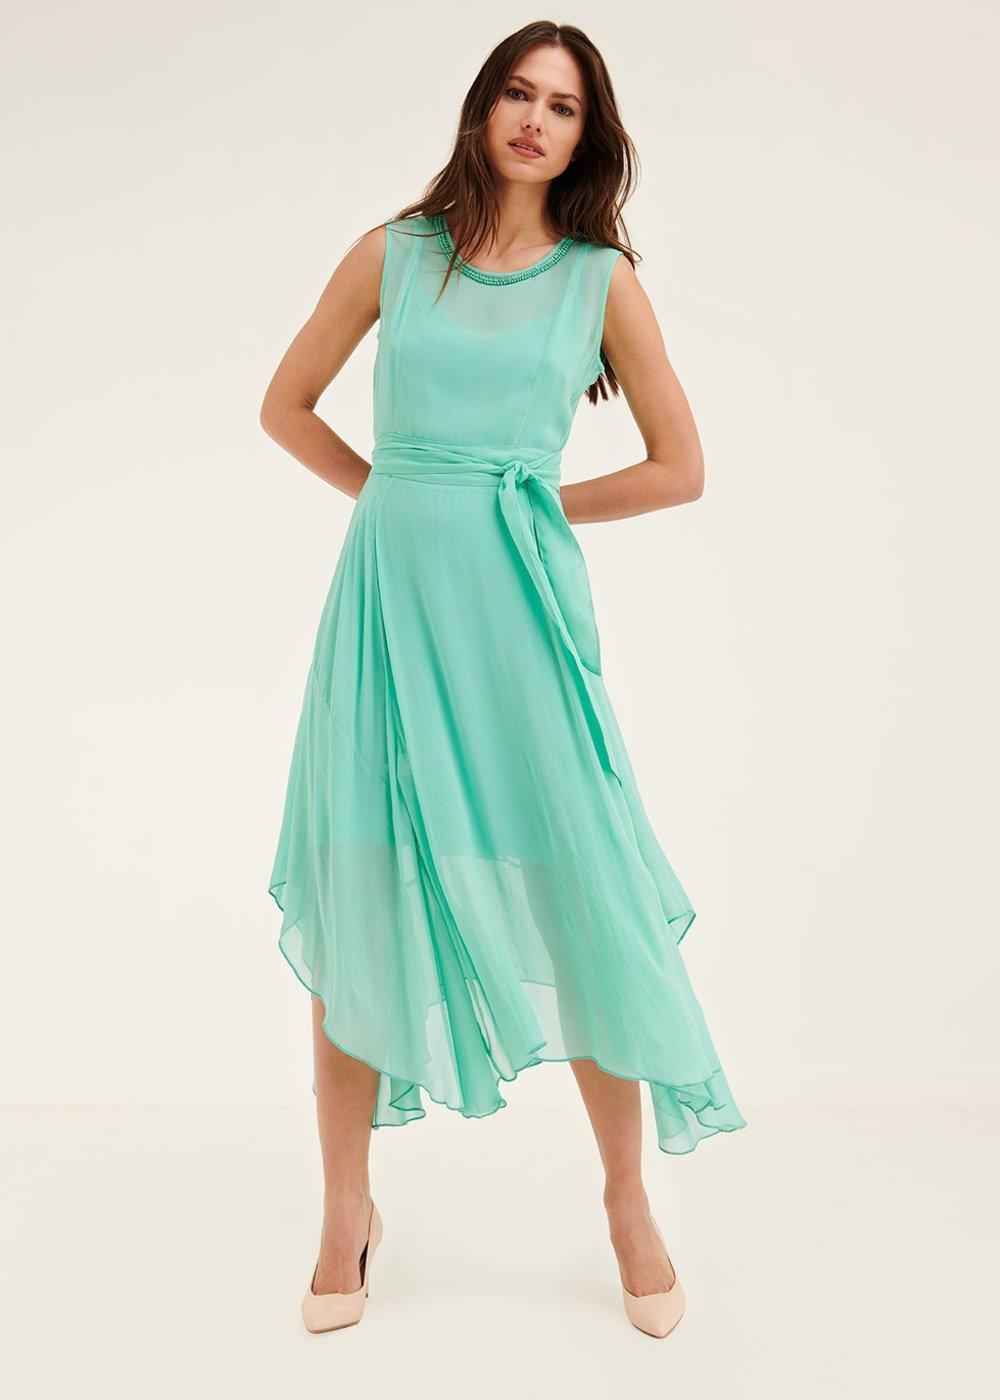 Ayrton dress with beaded embroidery - Smeraldo - Woman